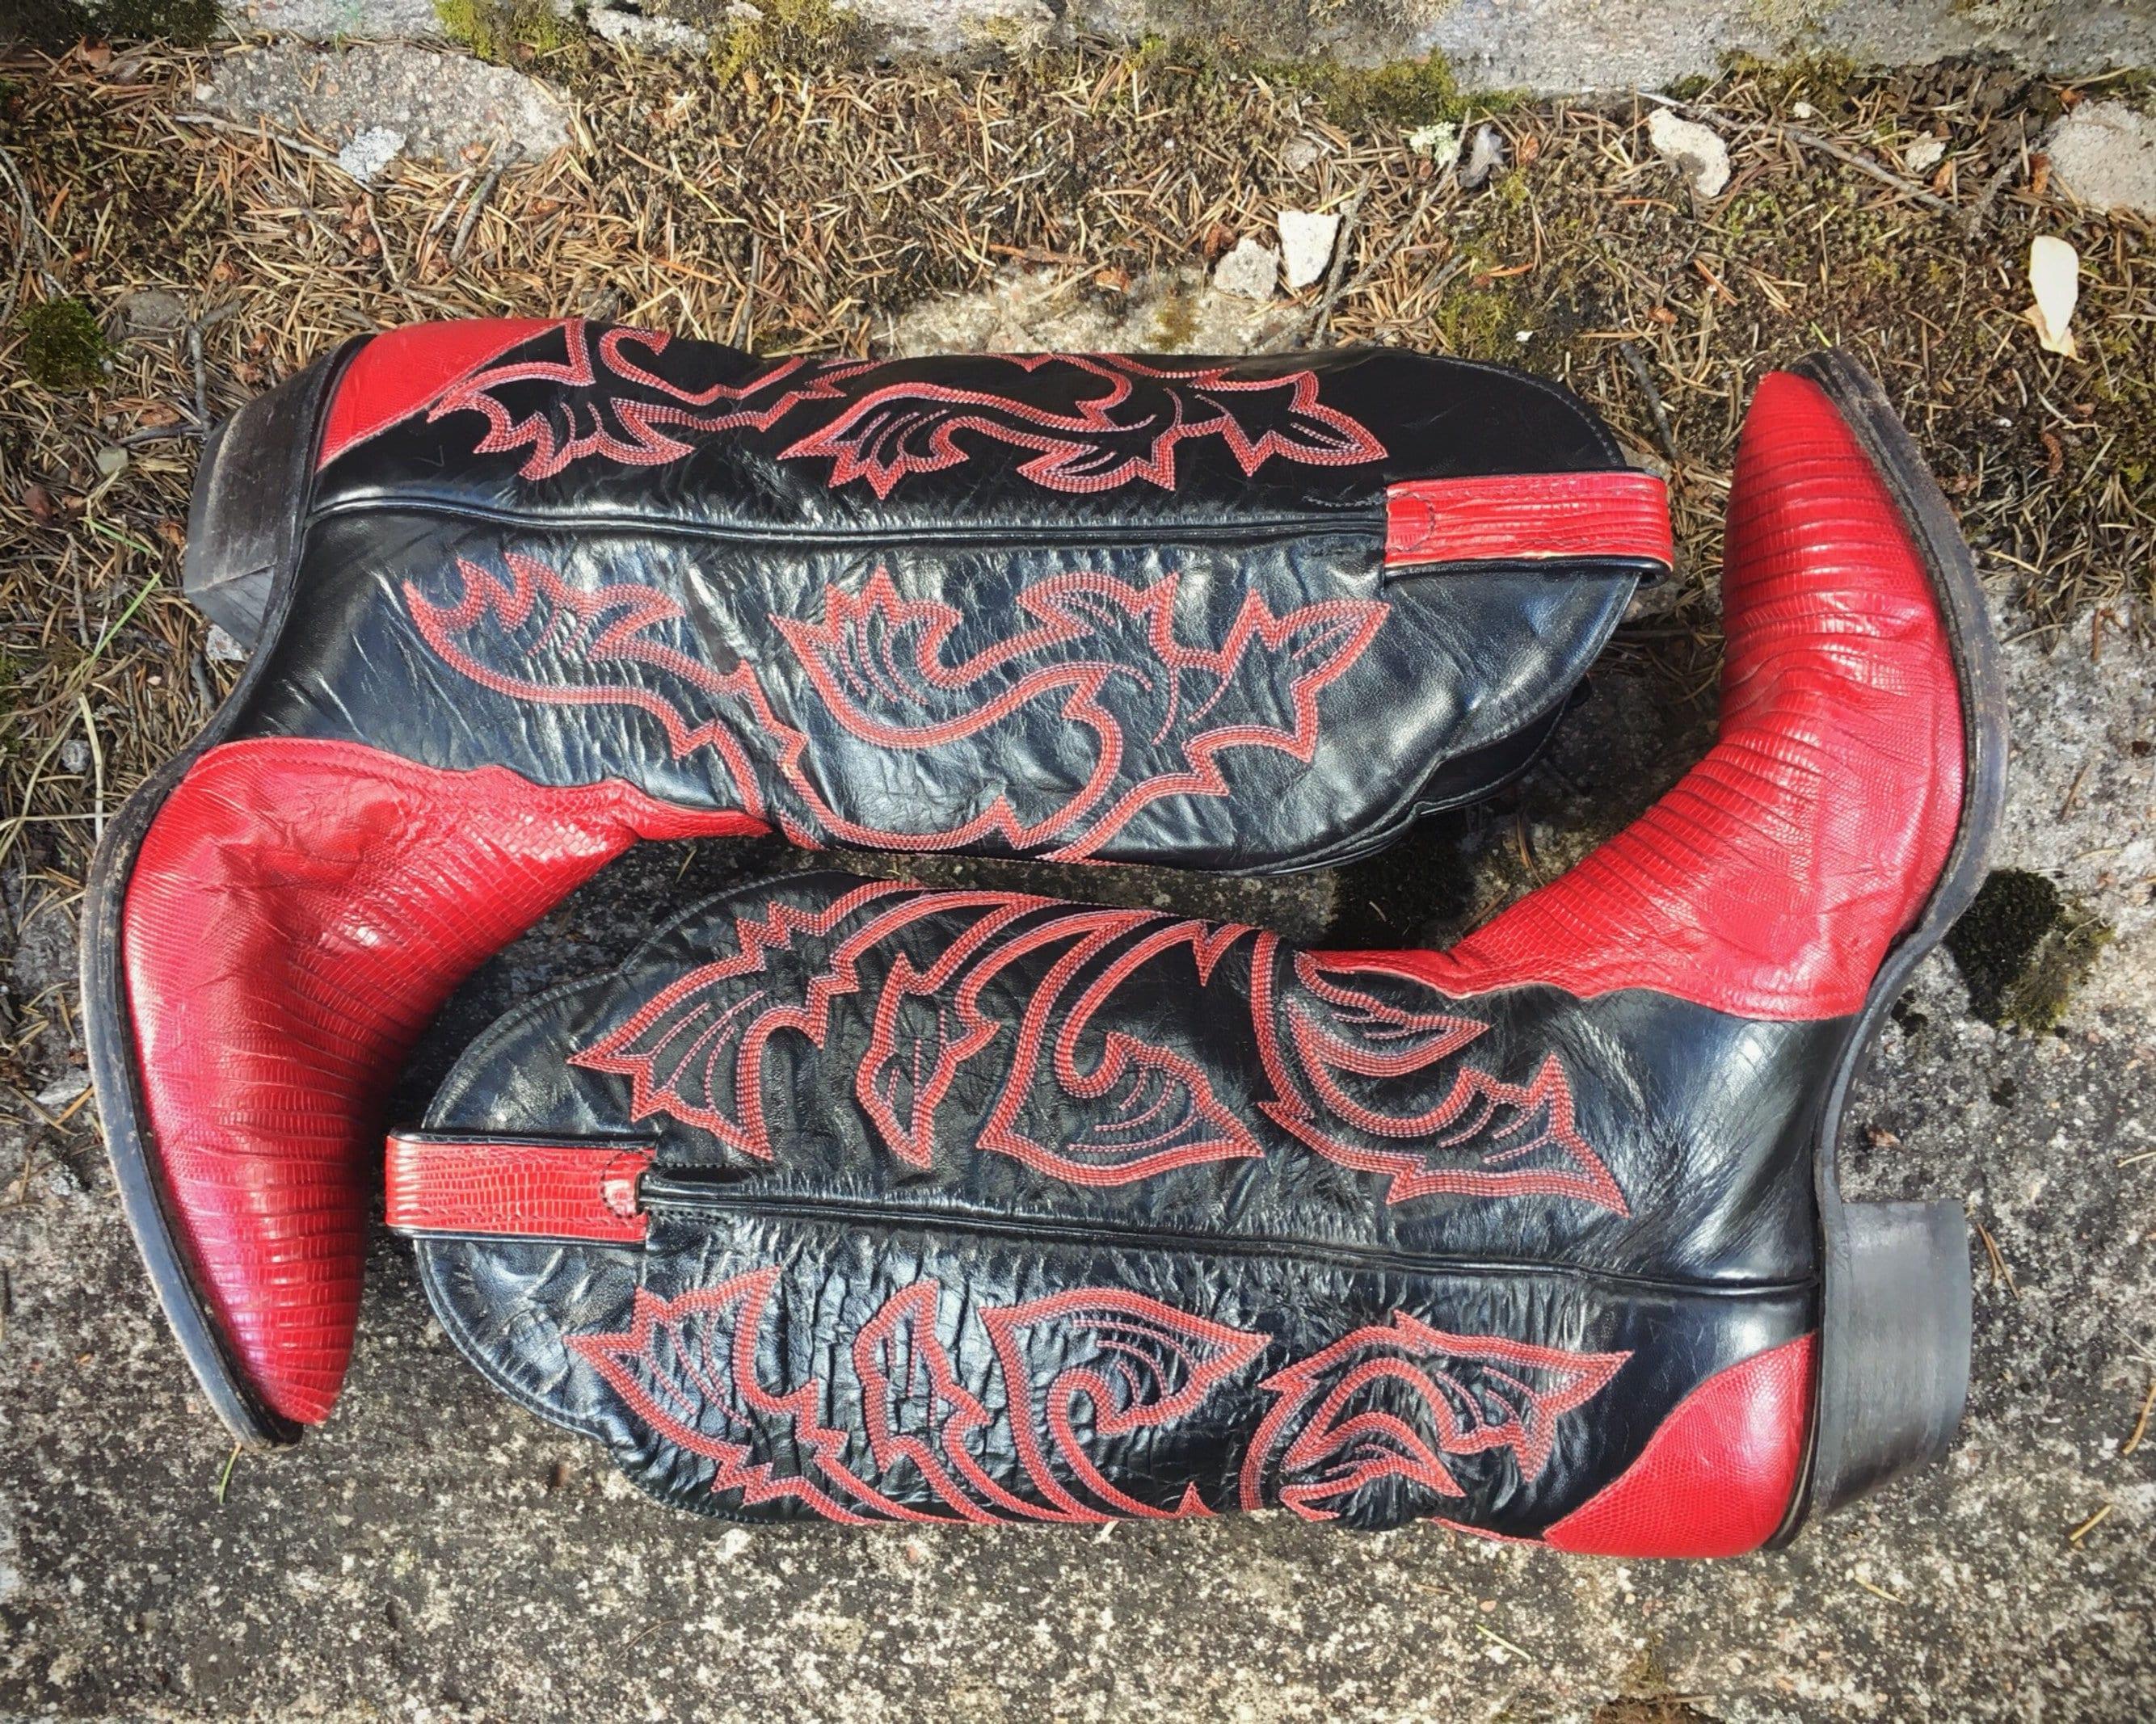 fbeb6336623 Vintage Tony Lama Cowboy Boots for Women Size 9 M (Runs Small ...